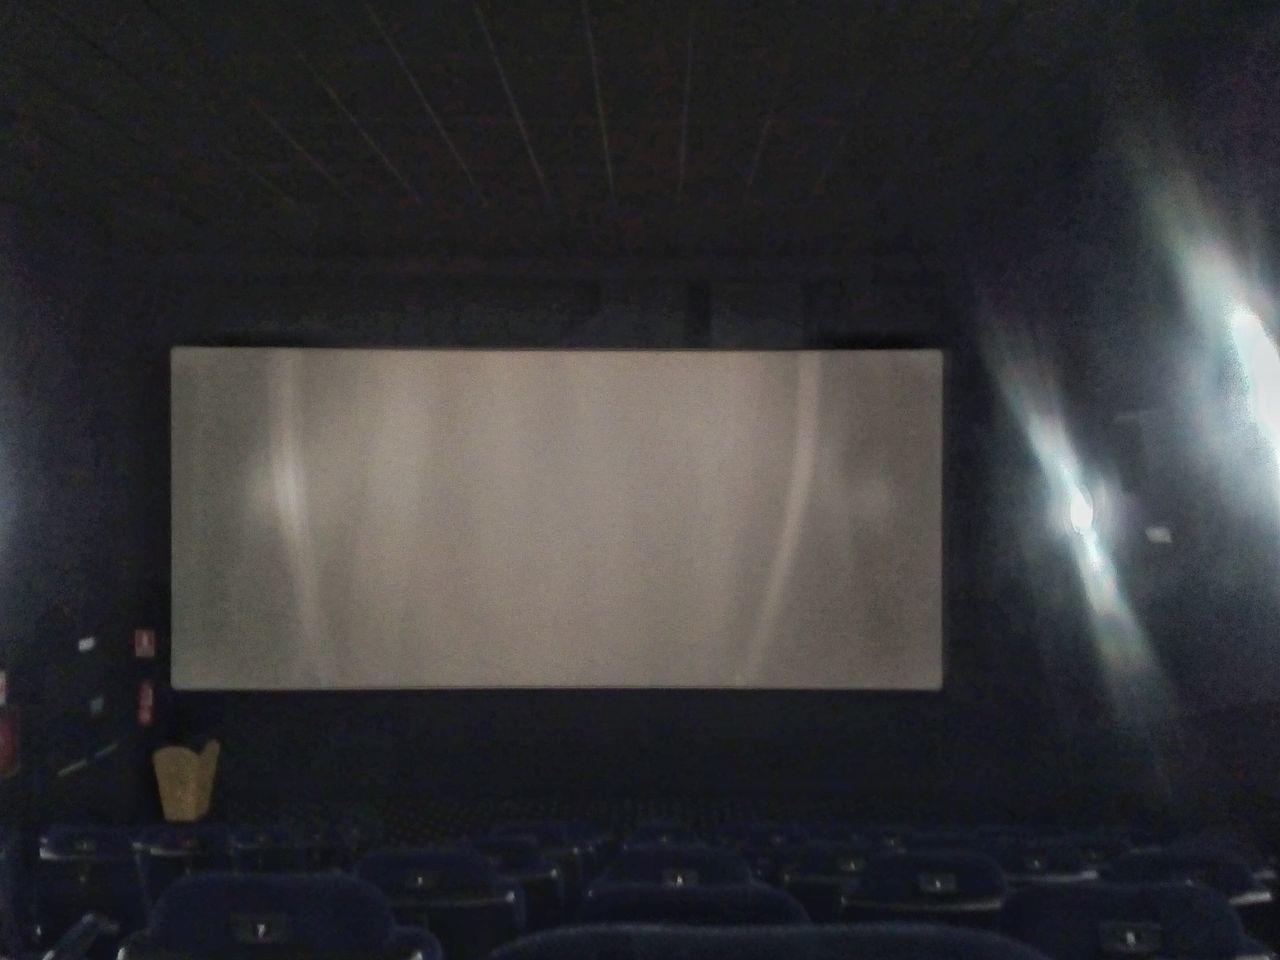 Taking Photos Goodnight EyeEm CinemaTime Light In The Darkness Good Night make your own movie. Blank cinema screen